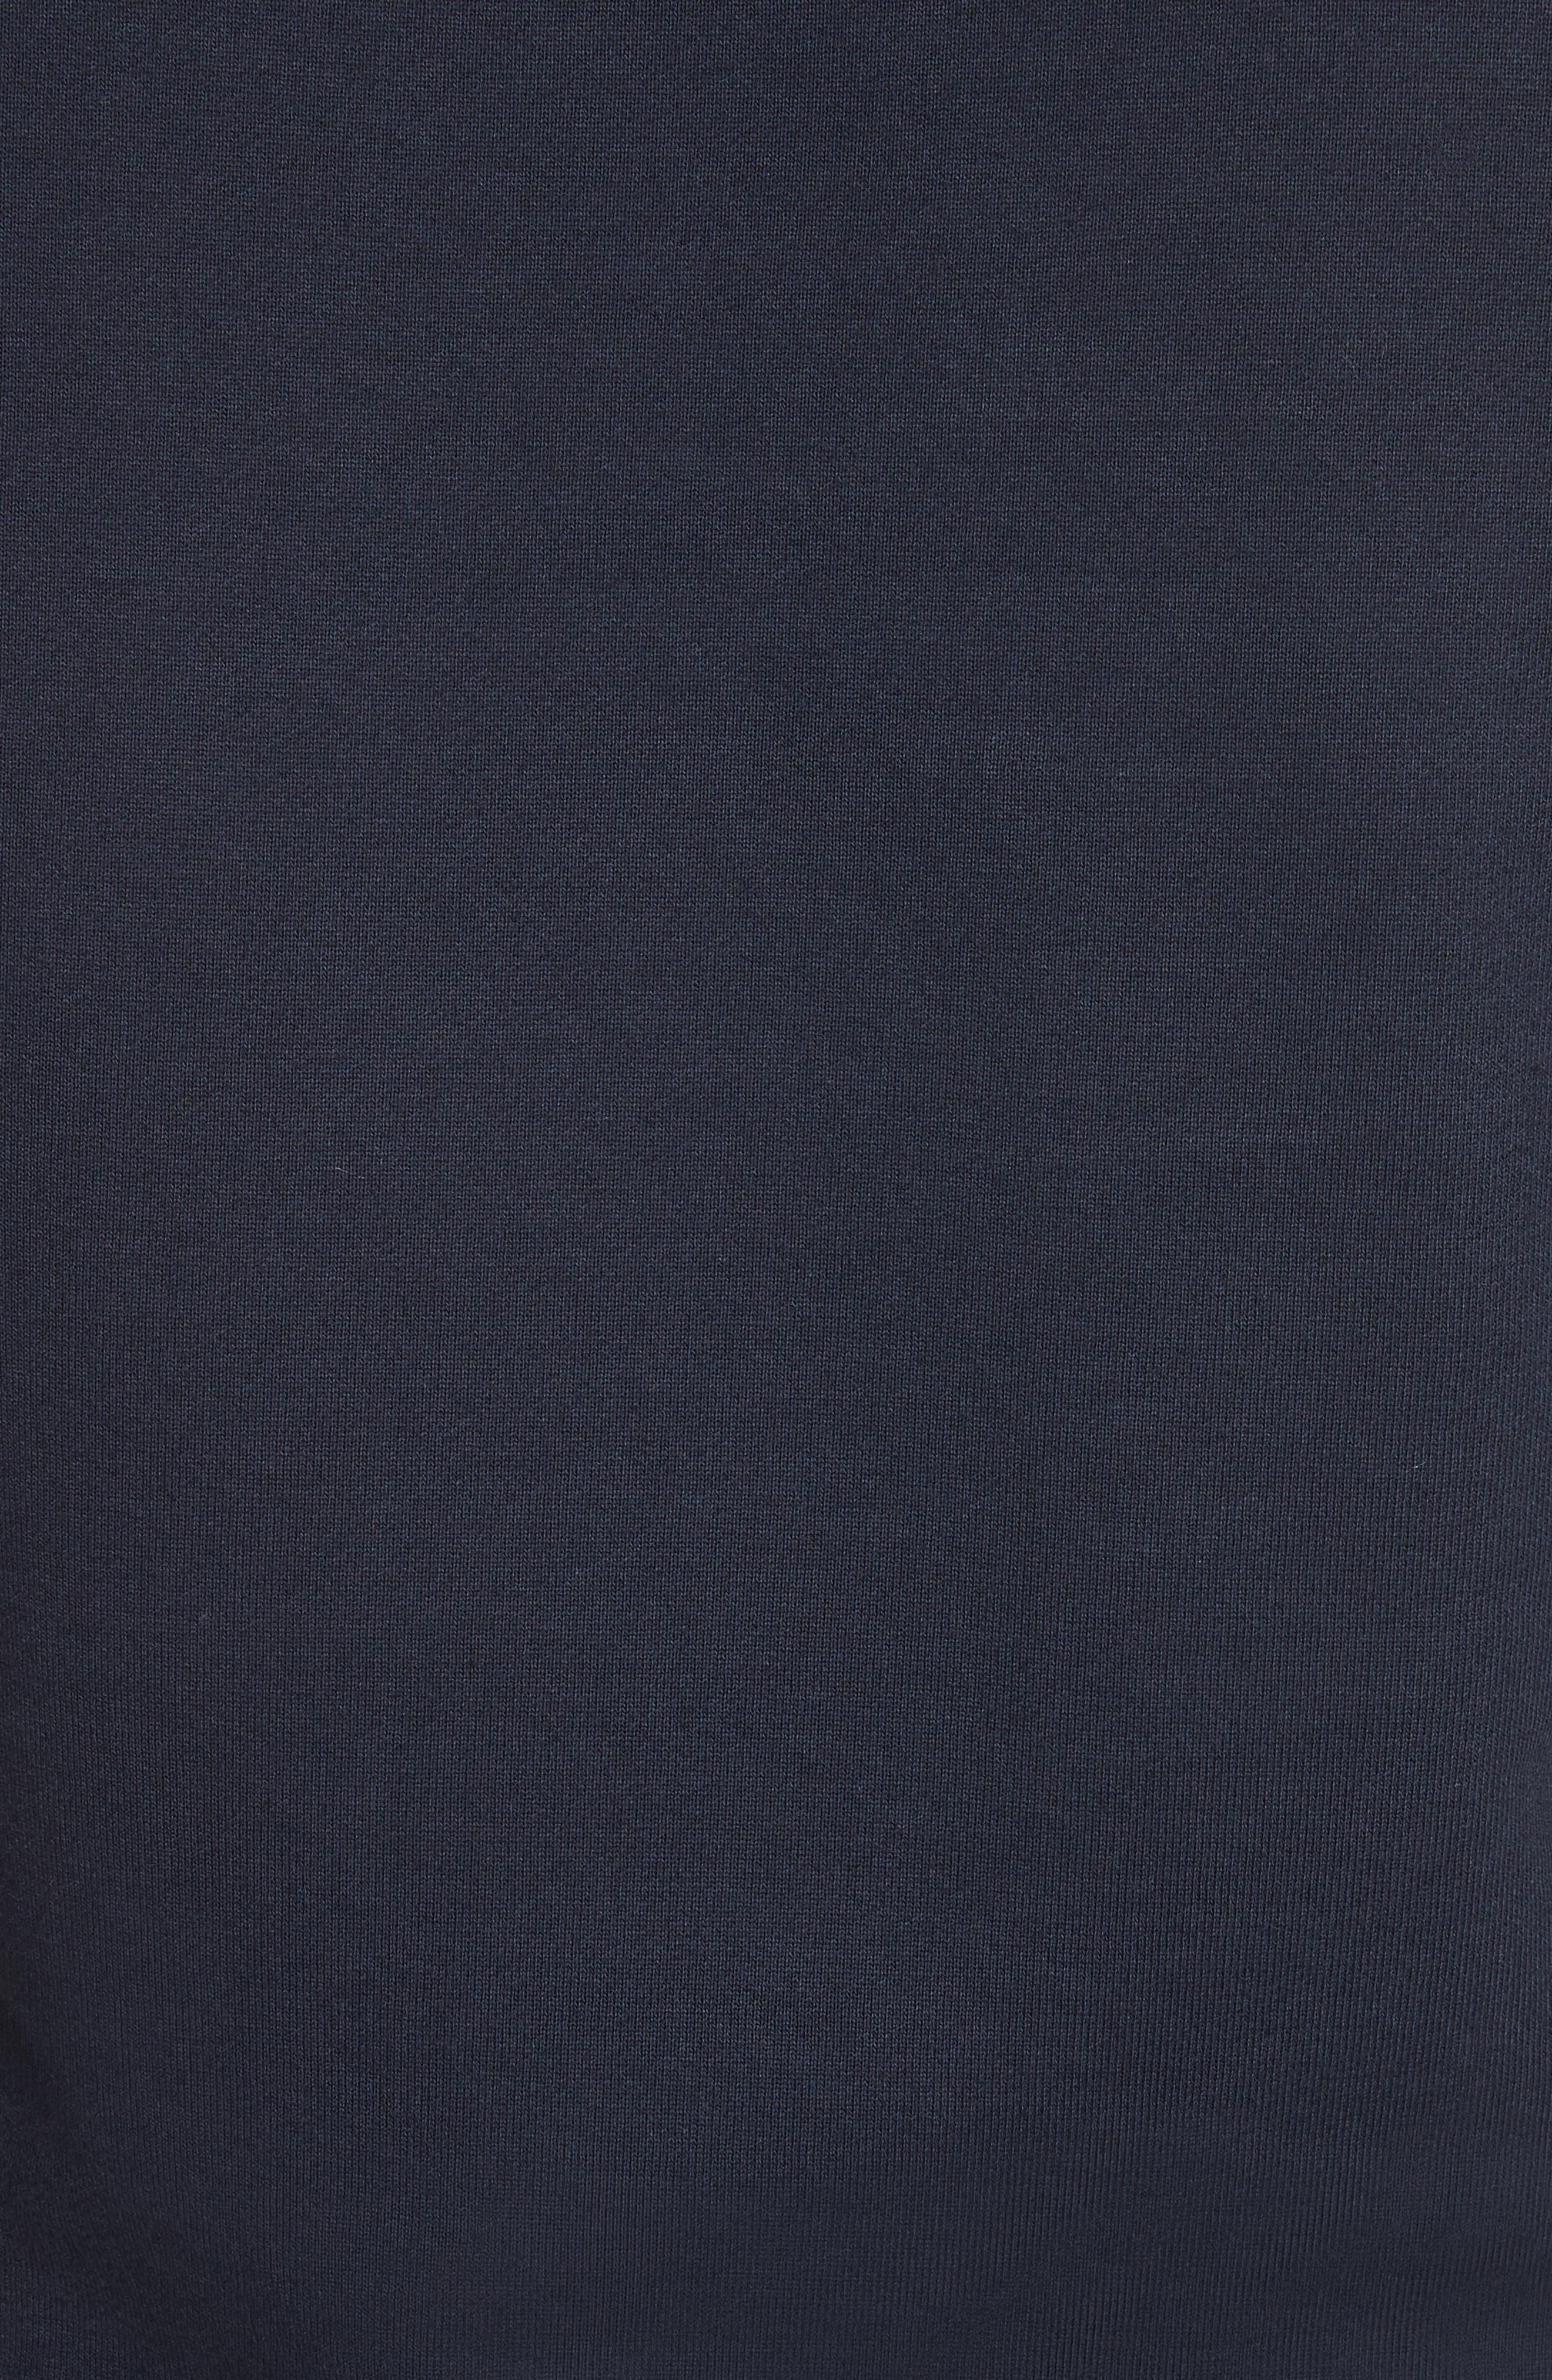 Smile Logo Raglan Crewneck Sweatshirt,                             Alternate thumbnail 5, color,                             Dark Navy